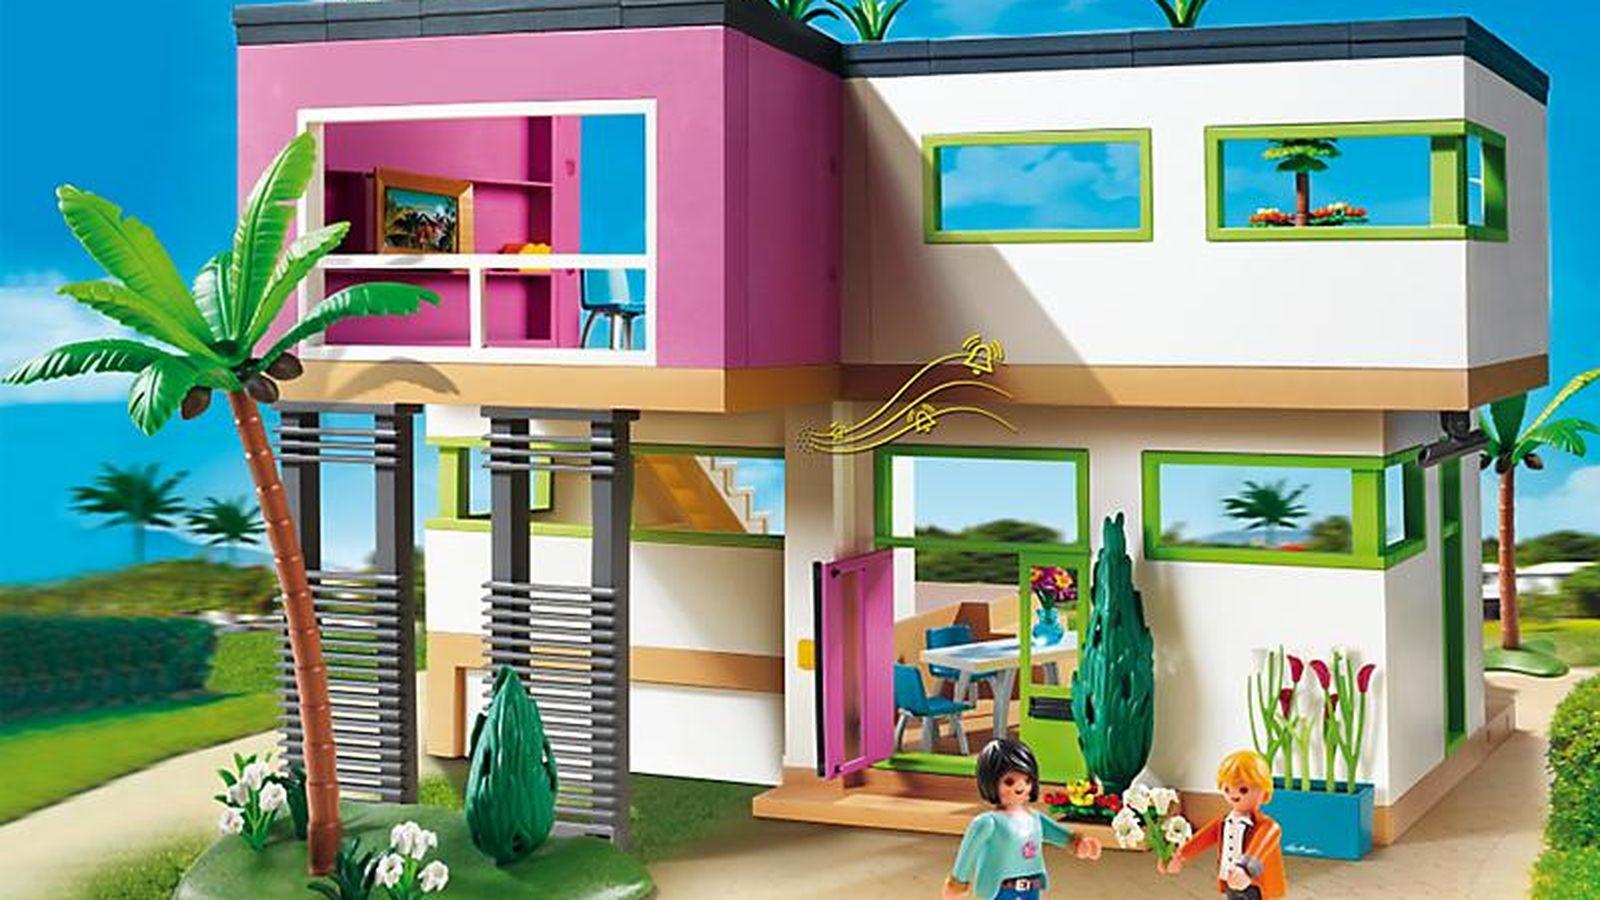 Vivienda la casa de lujo de playmobil valorada en 6 for Mansion de playmobil